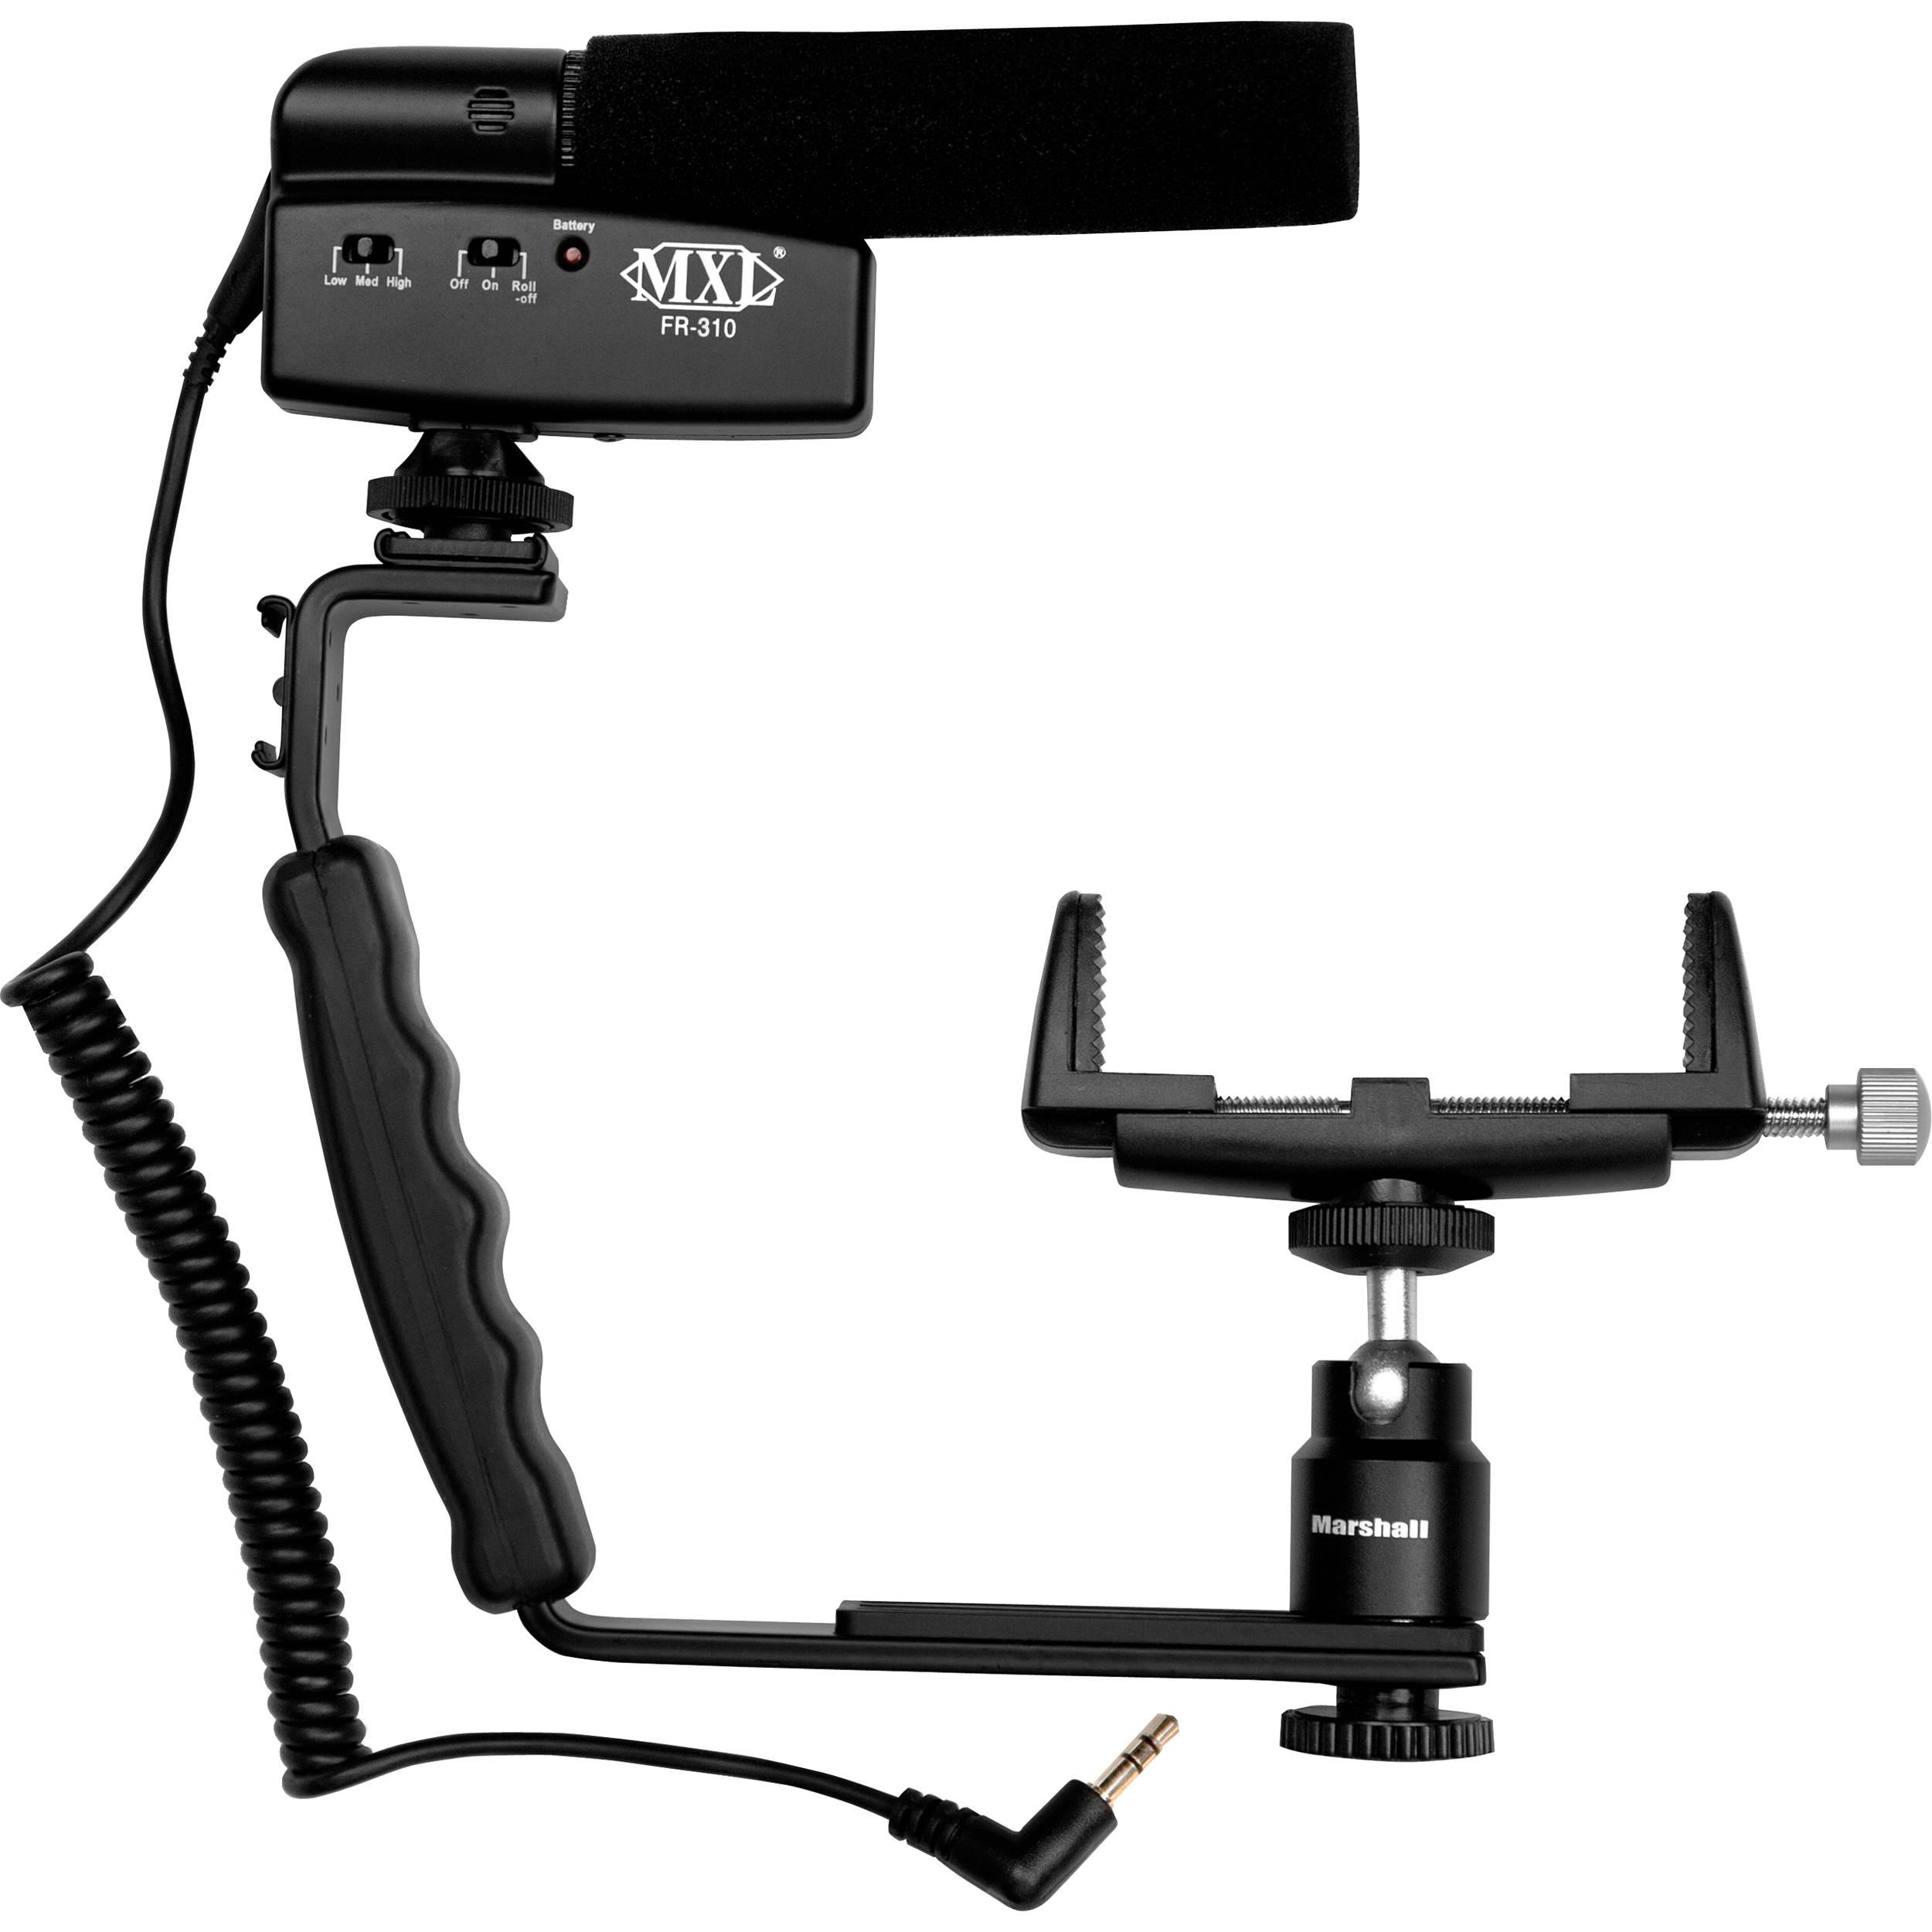 MXL MM-VE001 Mobile Media Videographer's Essentials Kit MM